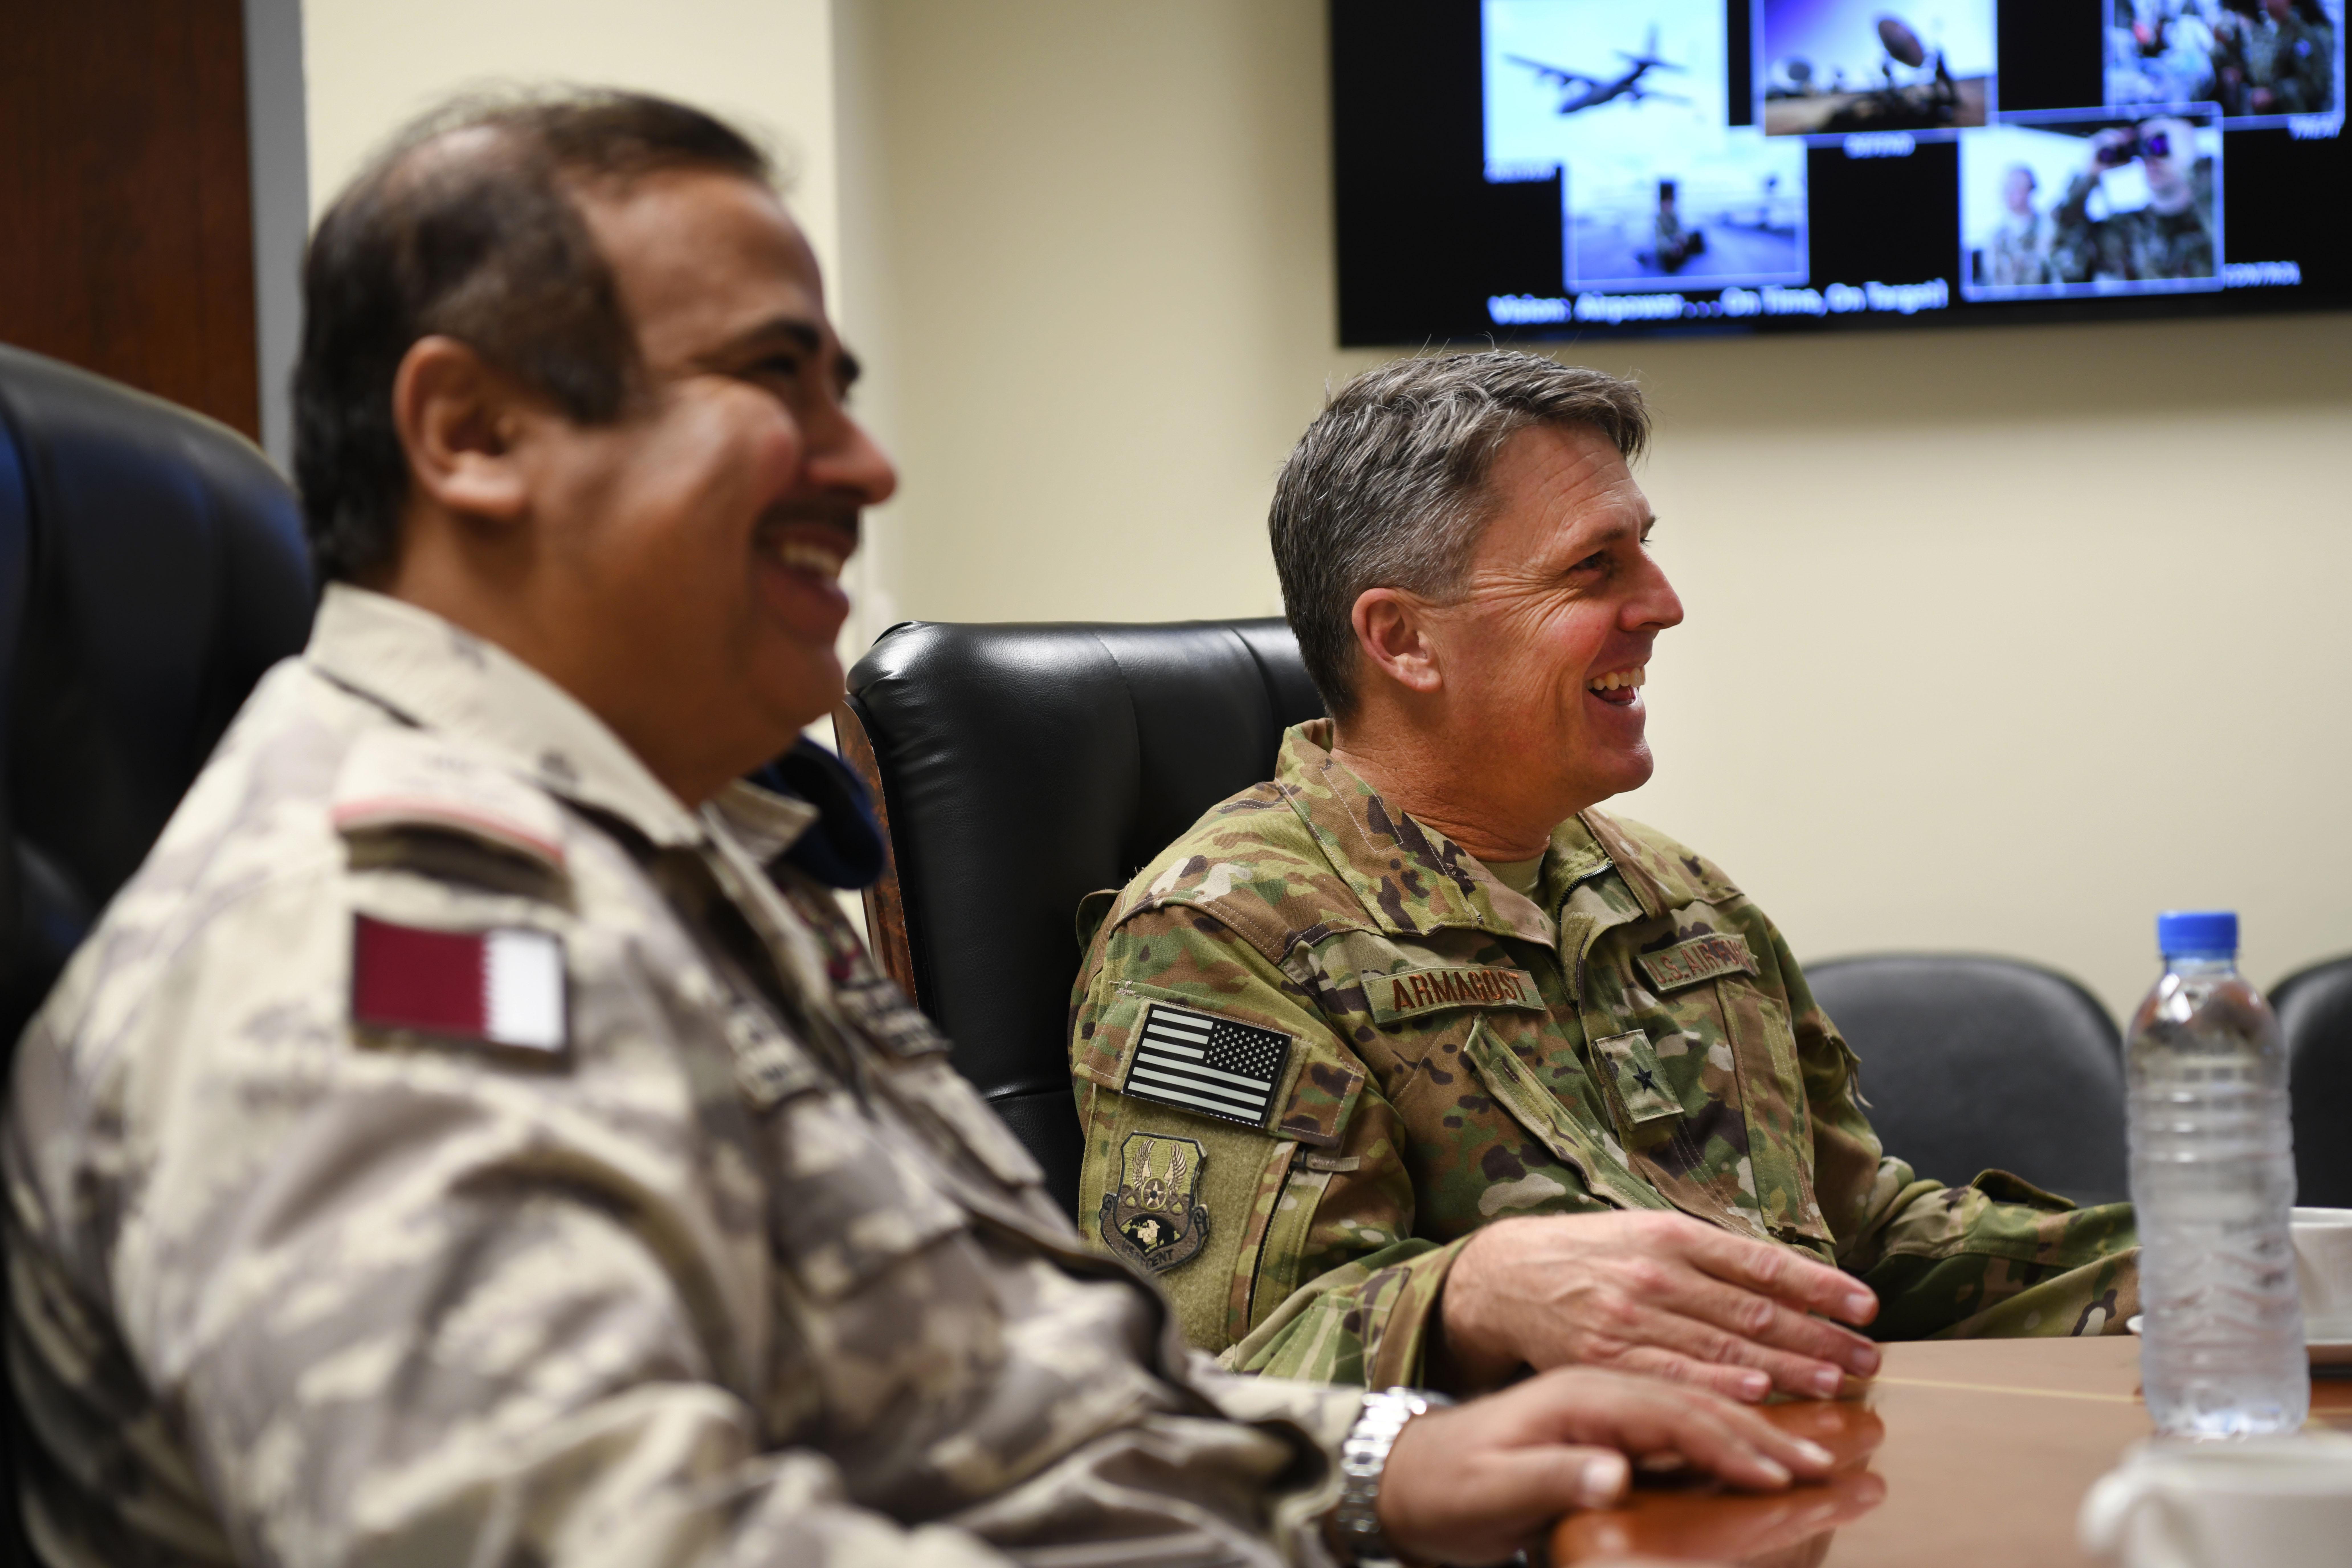 Qatar Emiri Air Force top leader visits 379th Air Expeditionary Wing